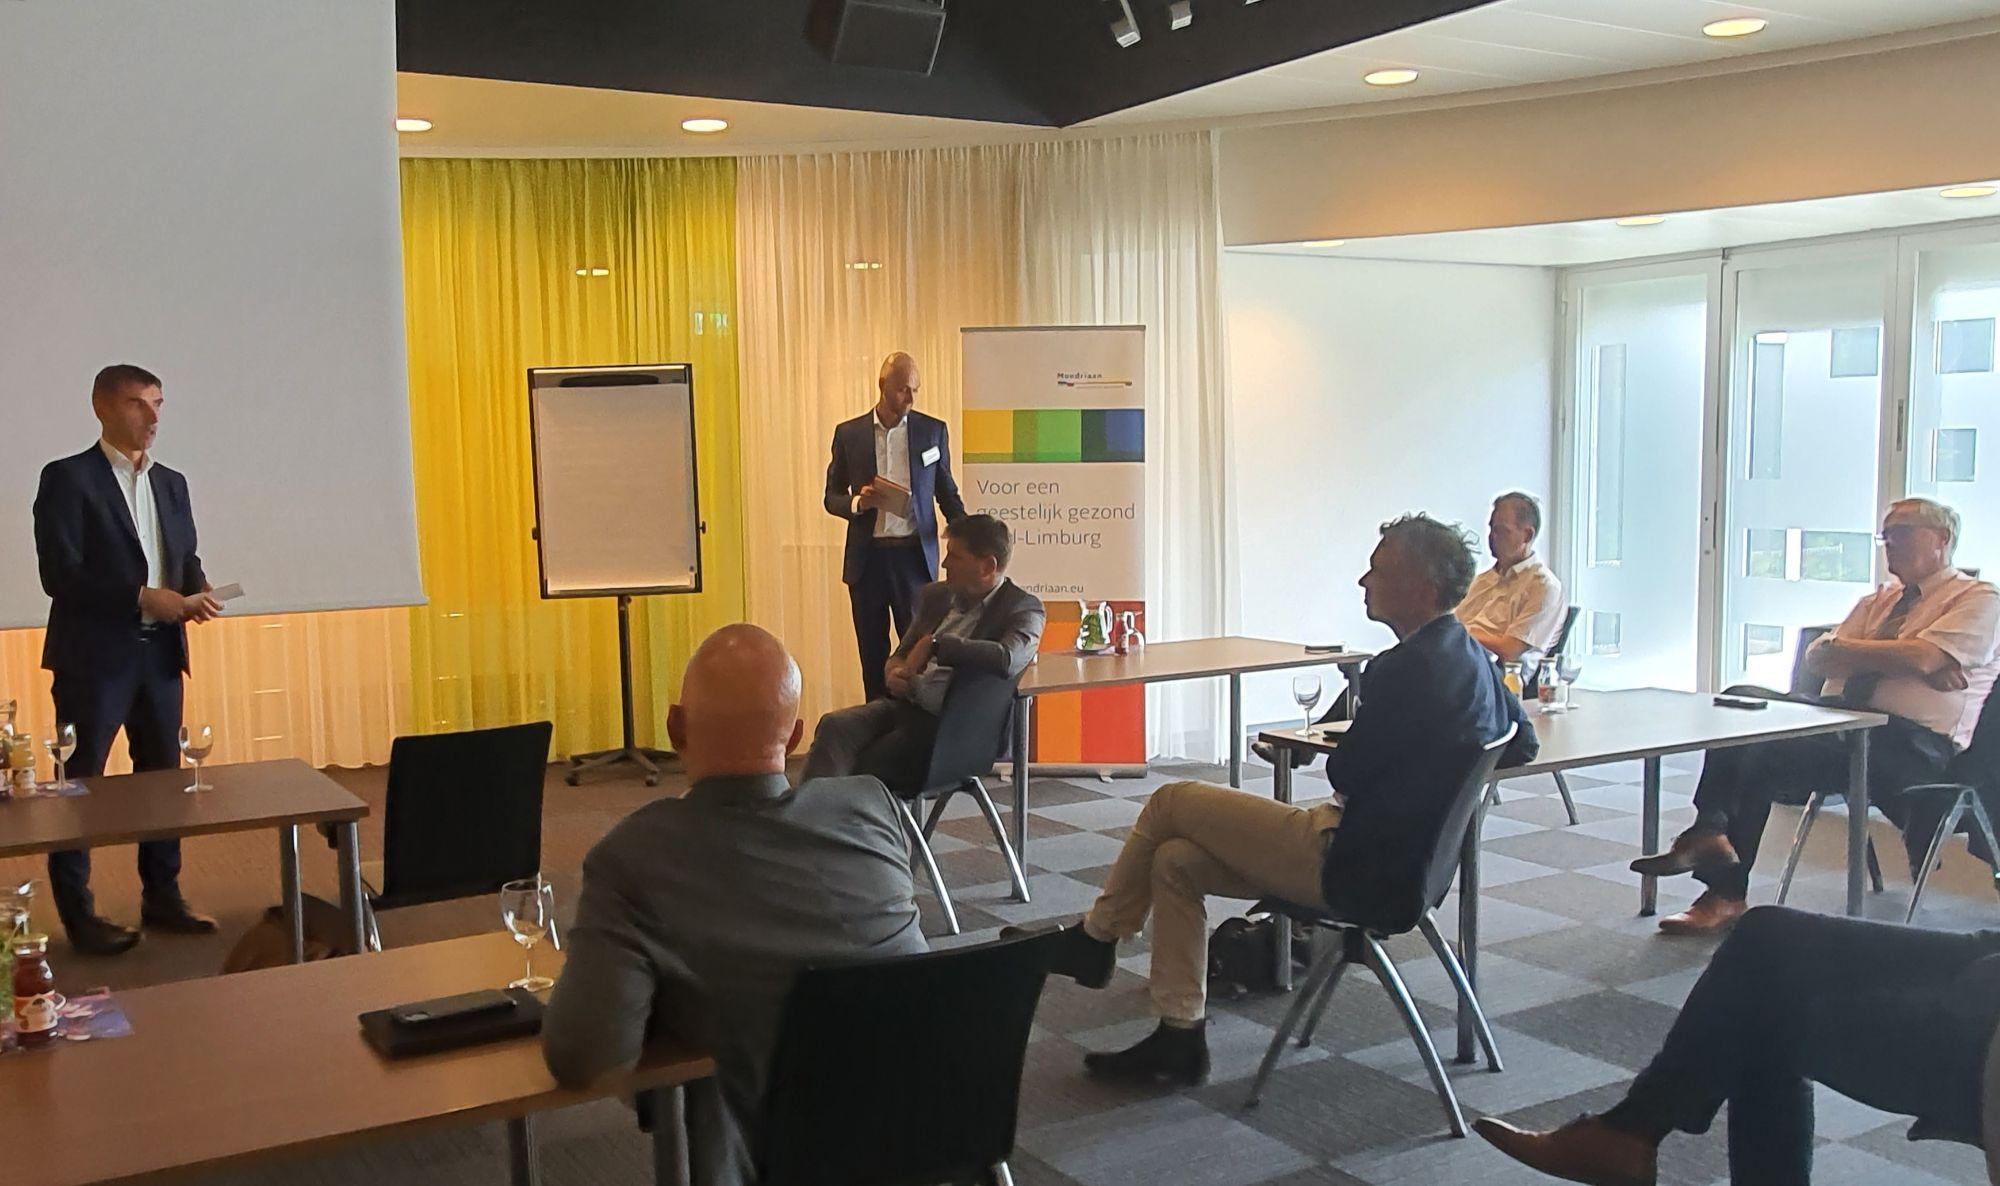 Paul Blokhuis spreekt de leden van de Regionale Taskforce Wachttijden Zuid-Limburg toe